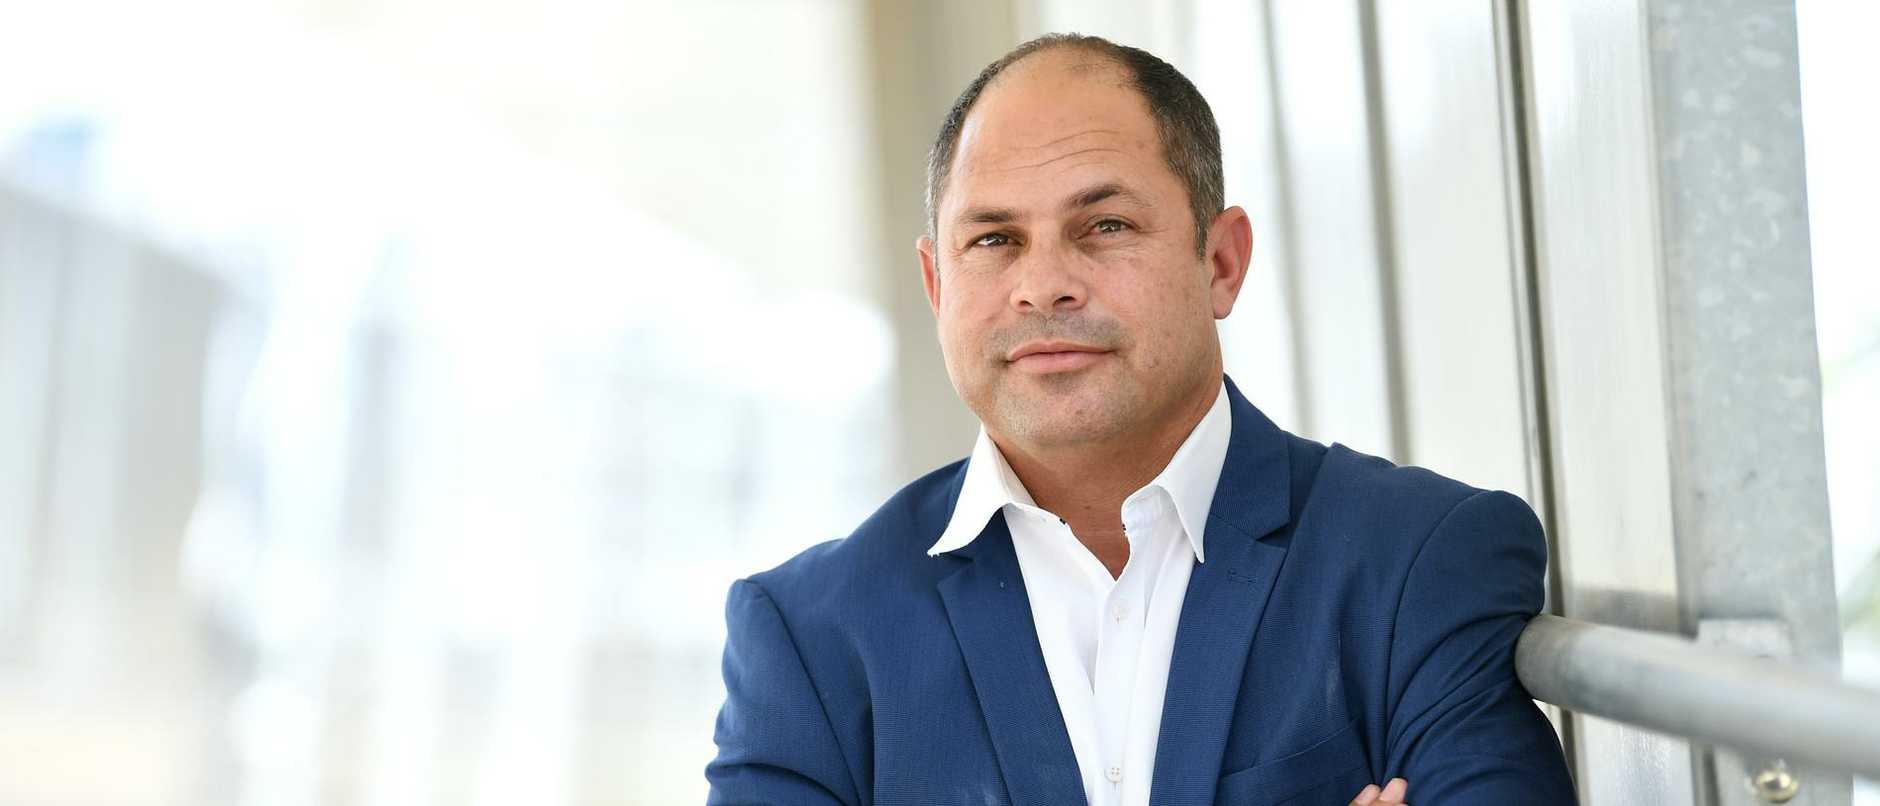 The CEO of North Stradbroke Island's Aboriginal entity has announced his shock resignation following the re-election of Labor.